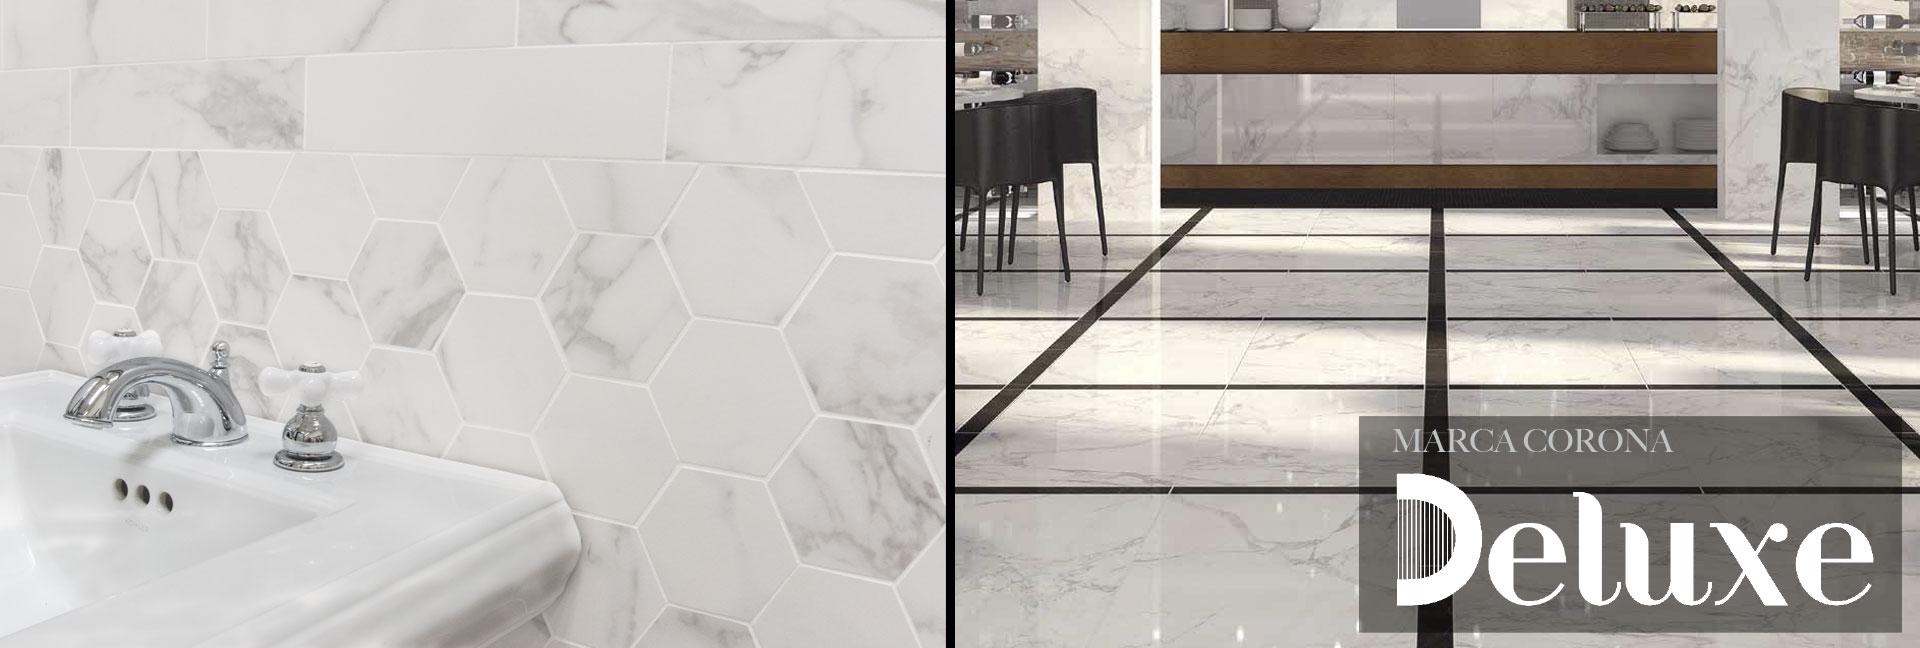 Marca Corona Deluxe - Italian Porcelain Tile